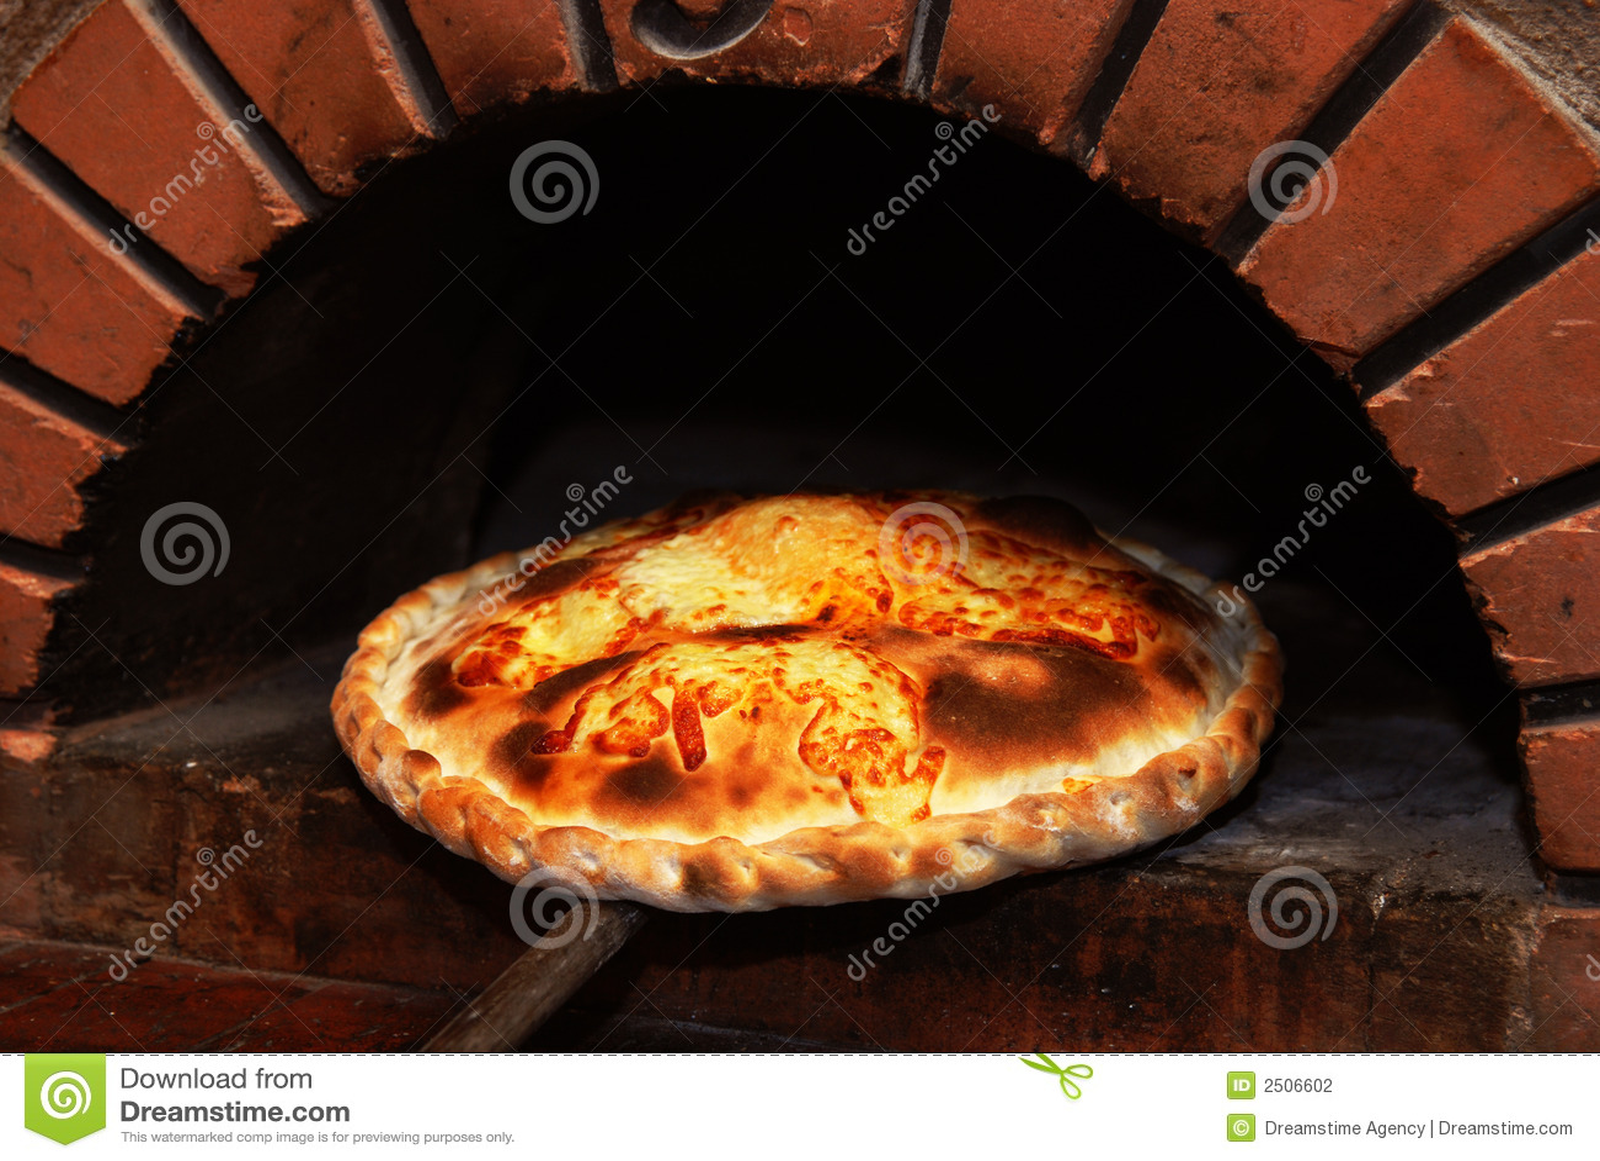 Pizza de um forno do tijolo